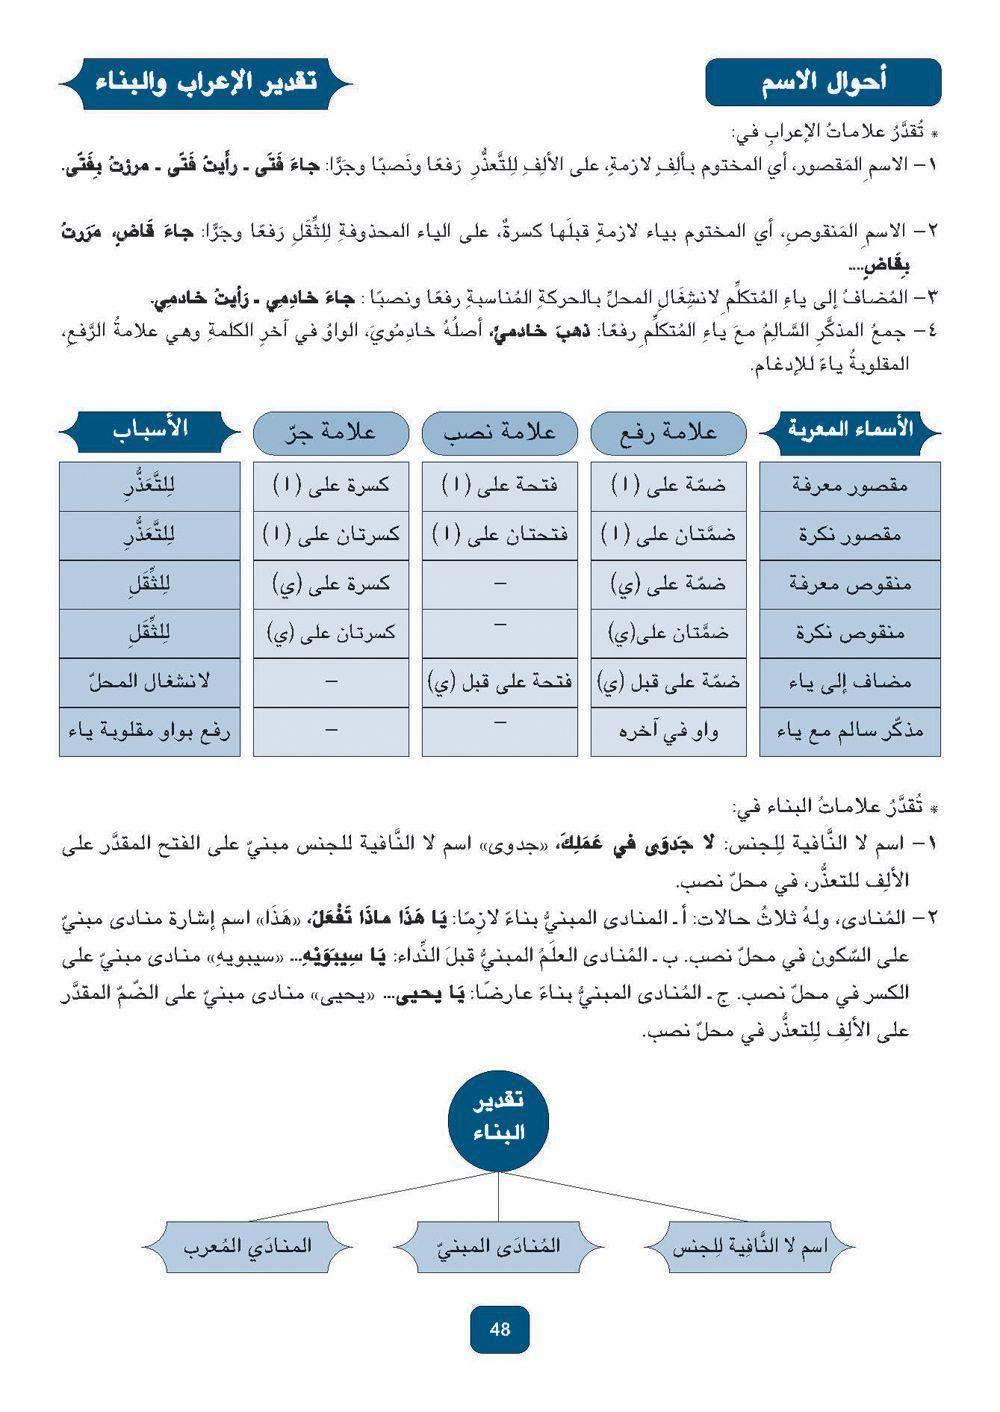 Arabic Grammar Learn Arabic Language Learning Arabic How To Memorize Things